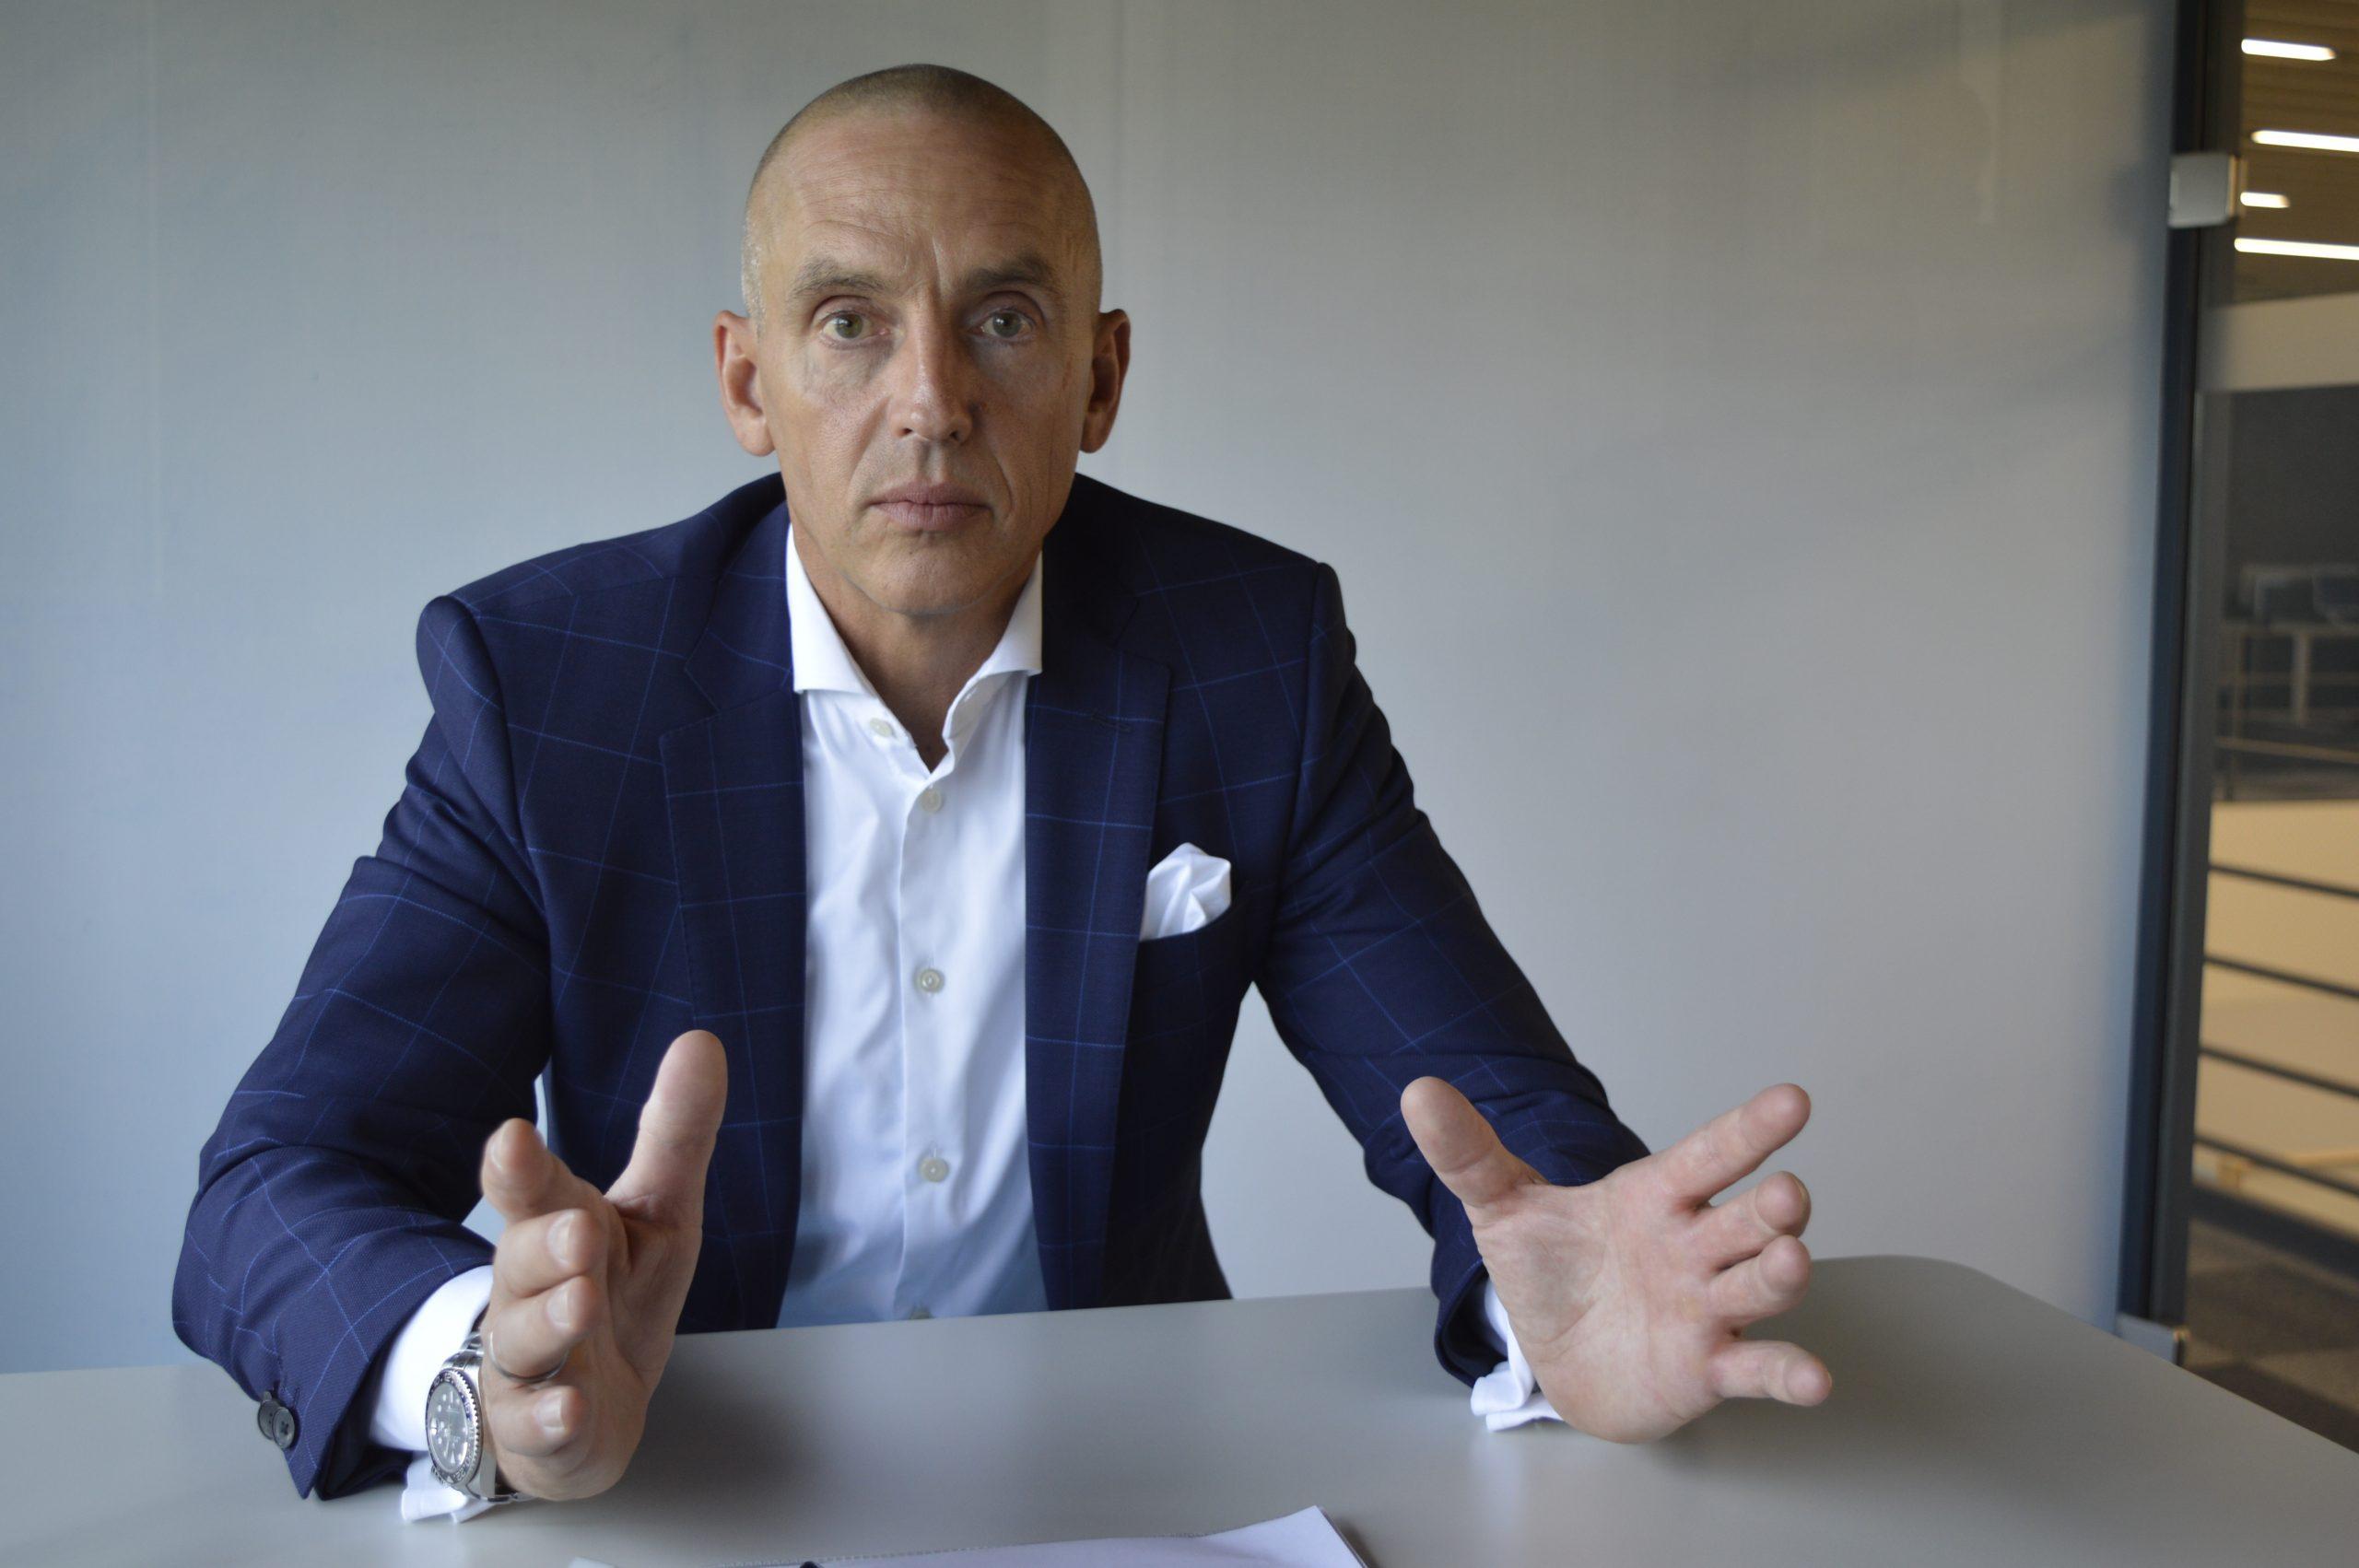 Steffen Winkler, Vertriebsleiter der Business Unit Automation & Electrification Solutions bei Bosch Rexroth (Bild: Bosch Rexroth AG)